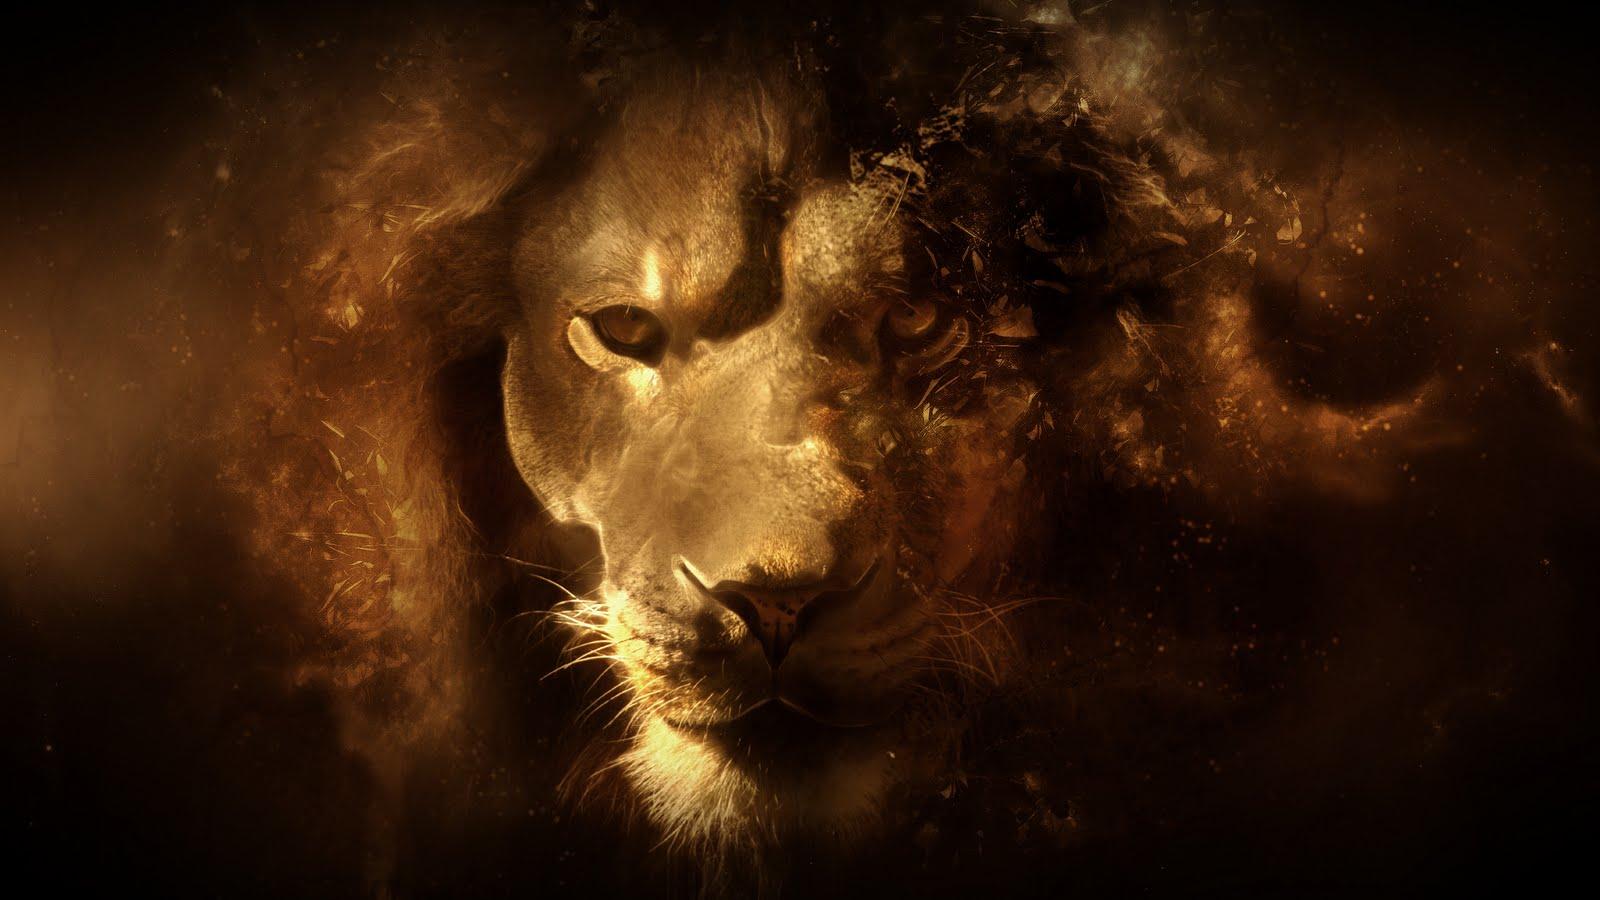 http://3.bp.blogspot.com/-Ep-uISOzgVs/UAXwhXRe6SI/AAAAAAAAAA0/LcjRIStn8pQ/s1600/lion_hd_wallpaper.jpg